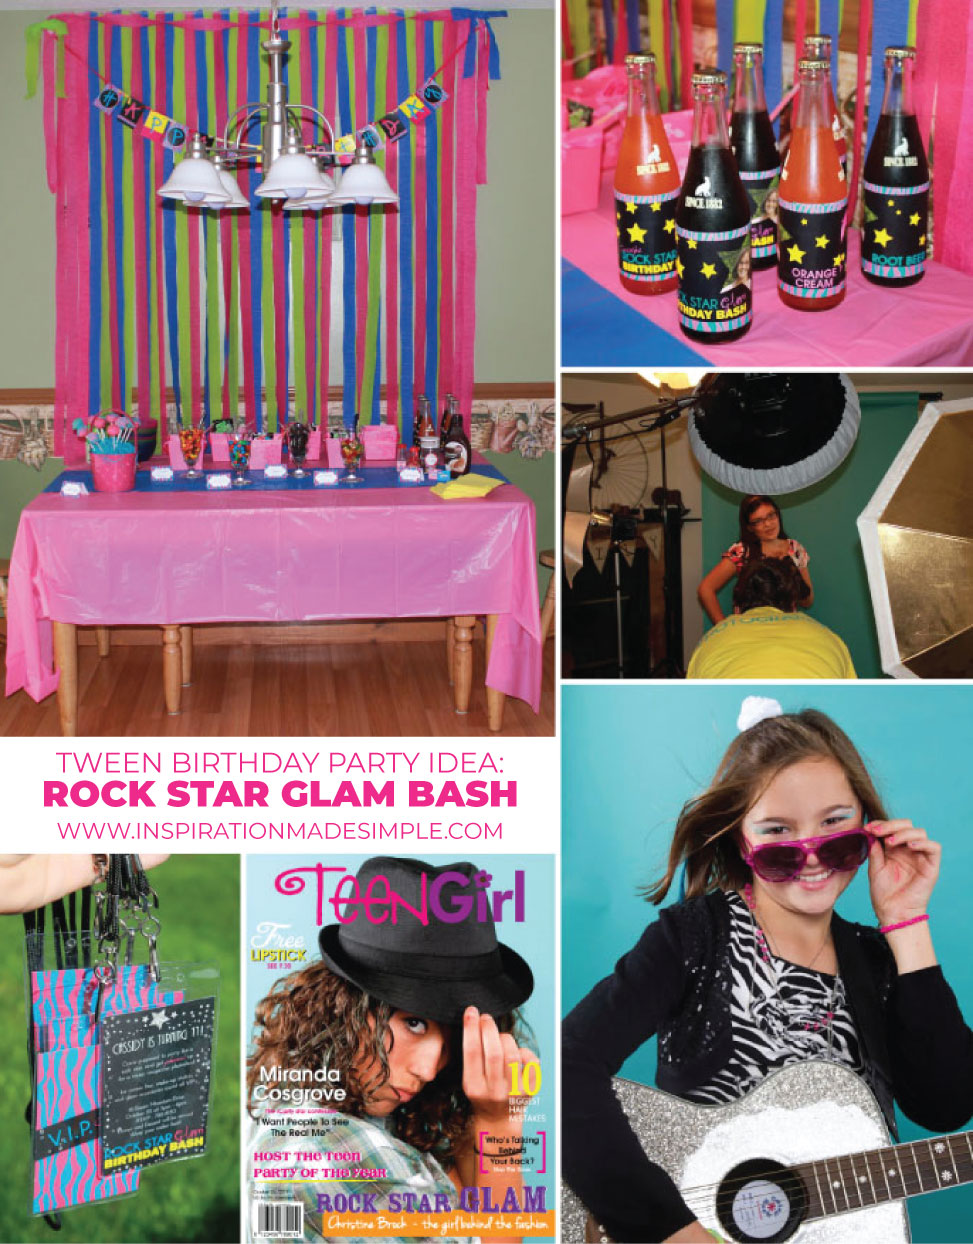 Tween Birthday Party: Rock Star Glam Bash